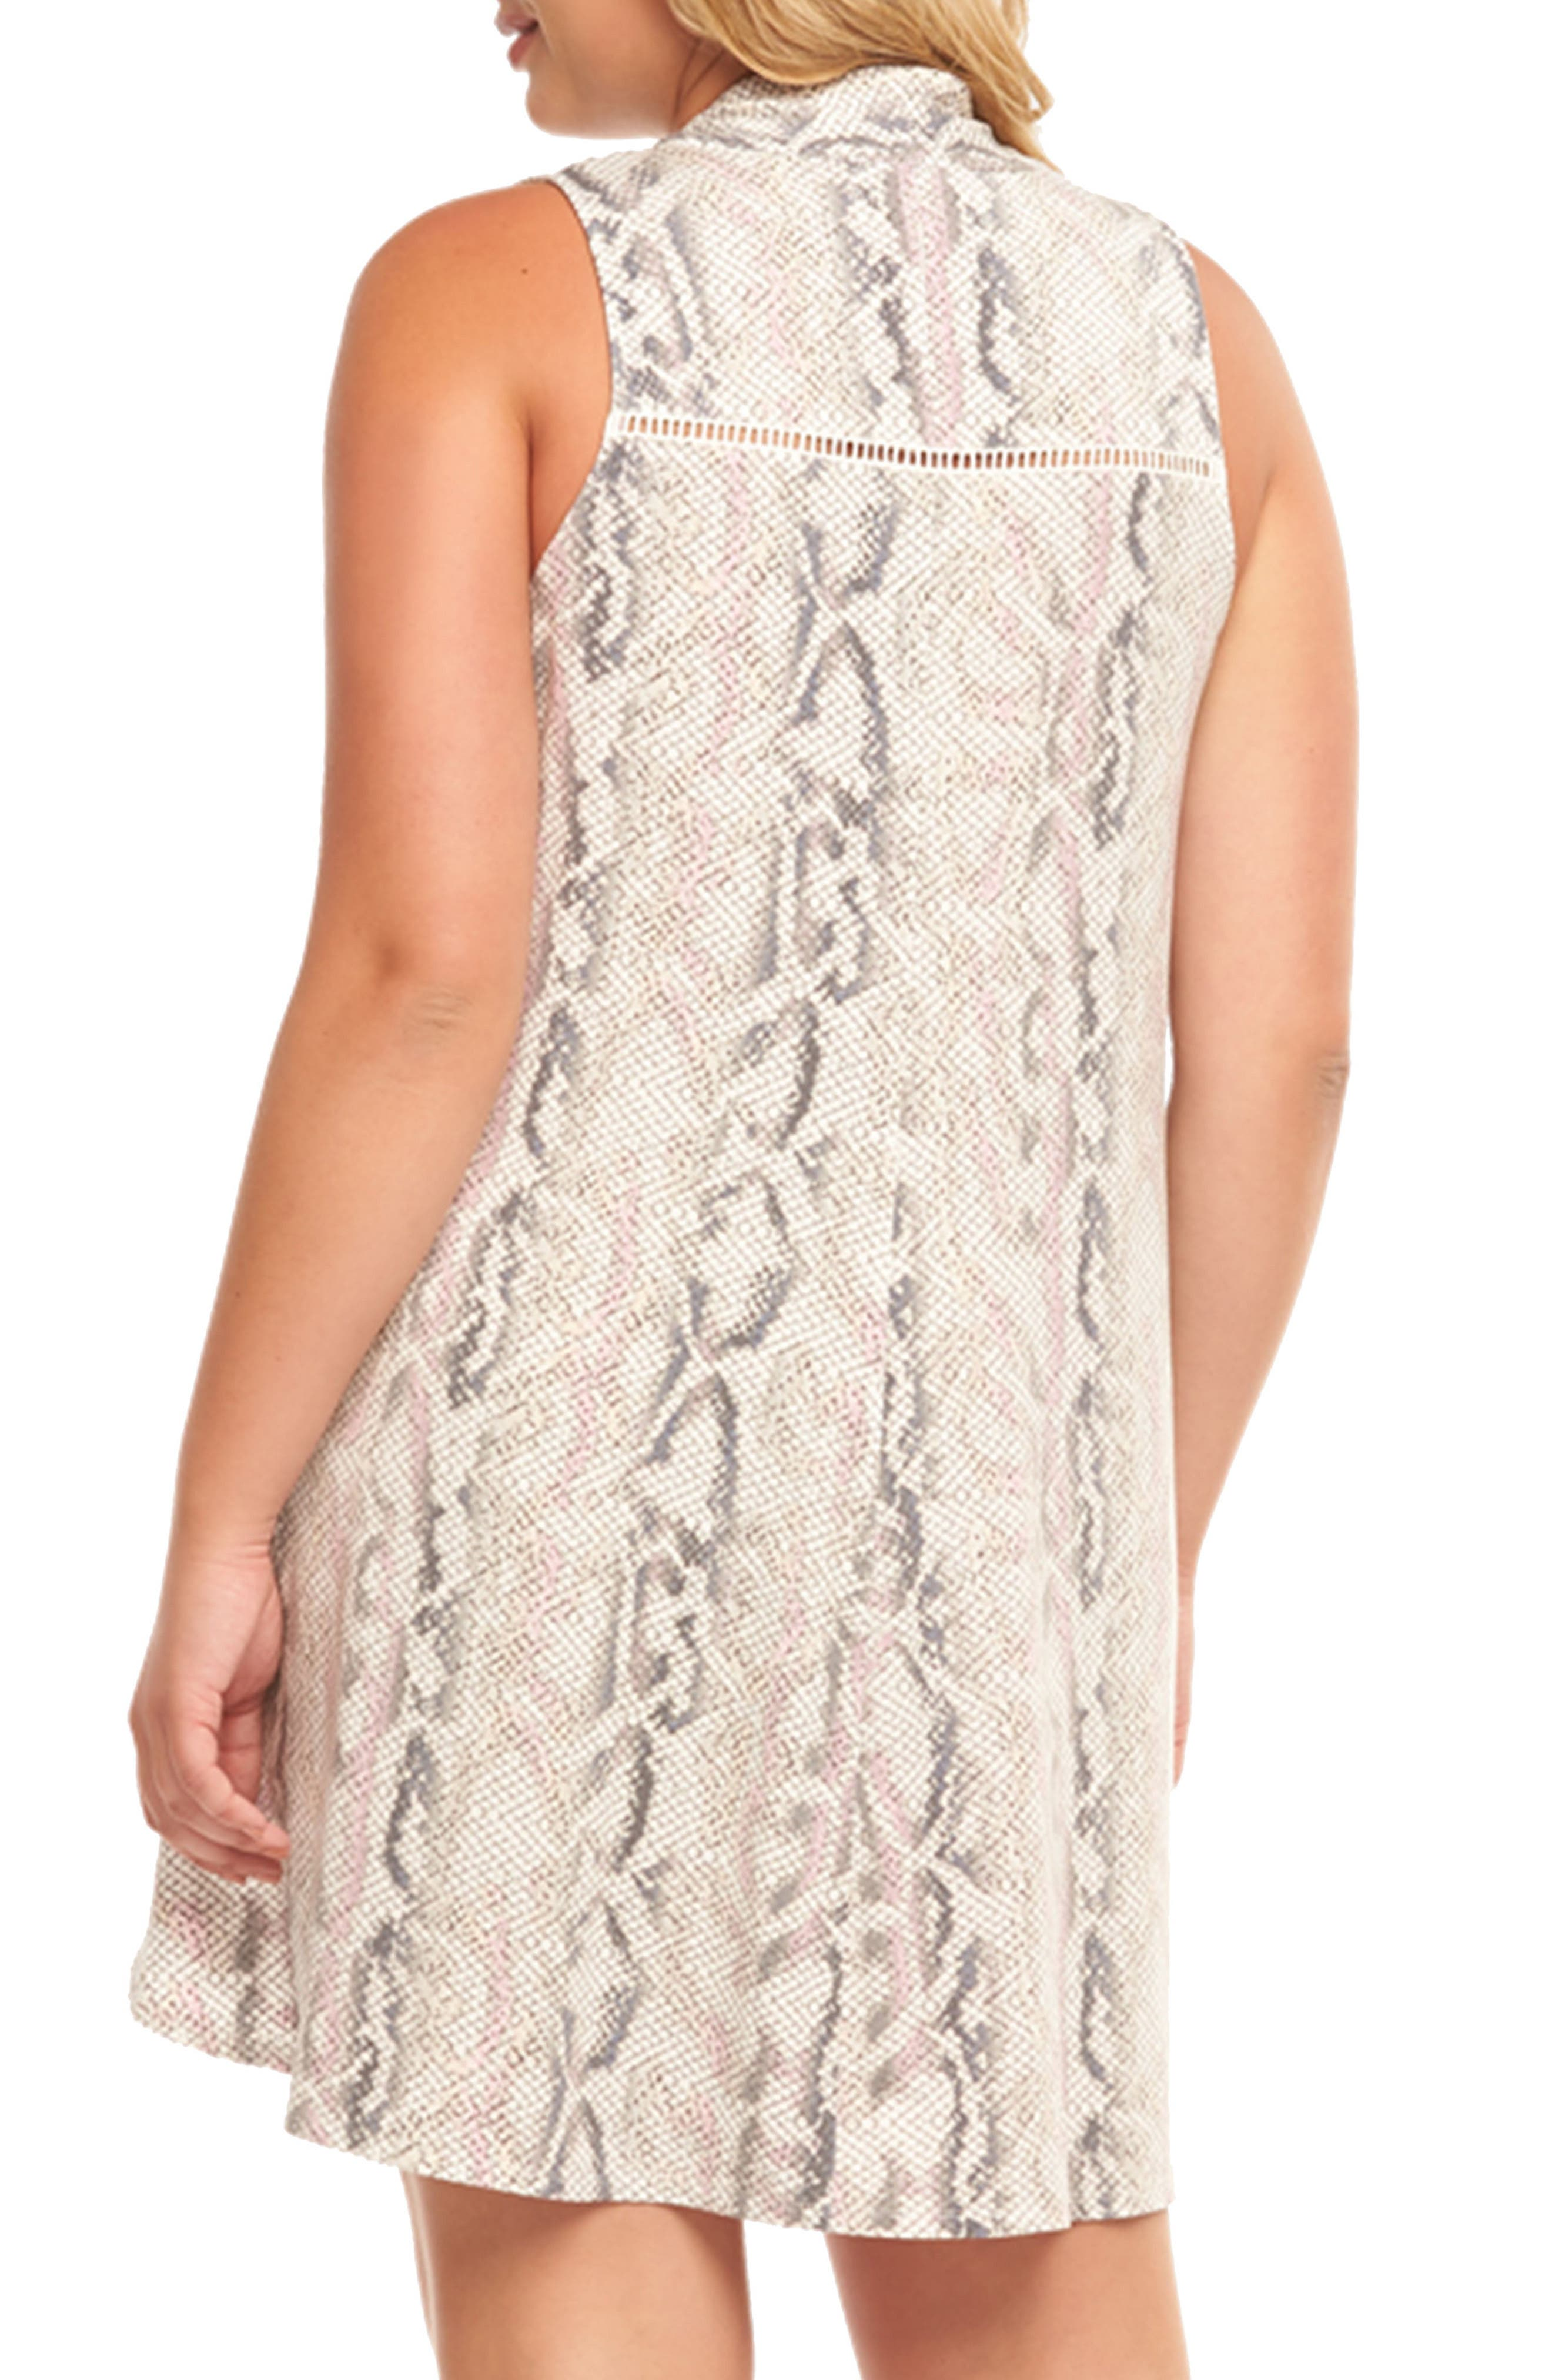 Alternate Image 2  - Tart Addilyn Print Minidress (Plus Size)